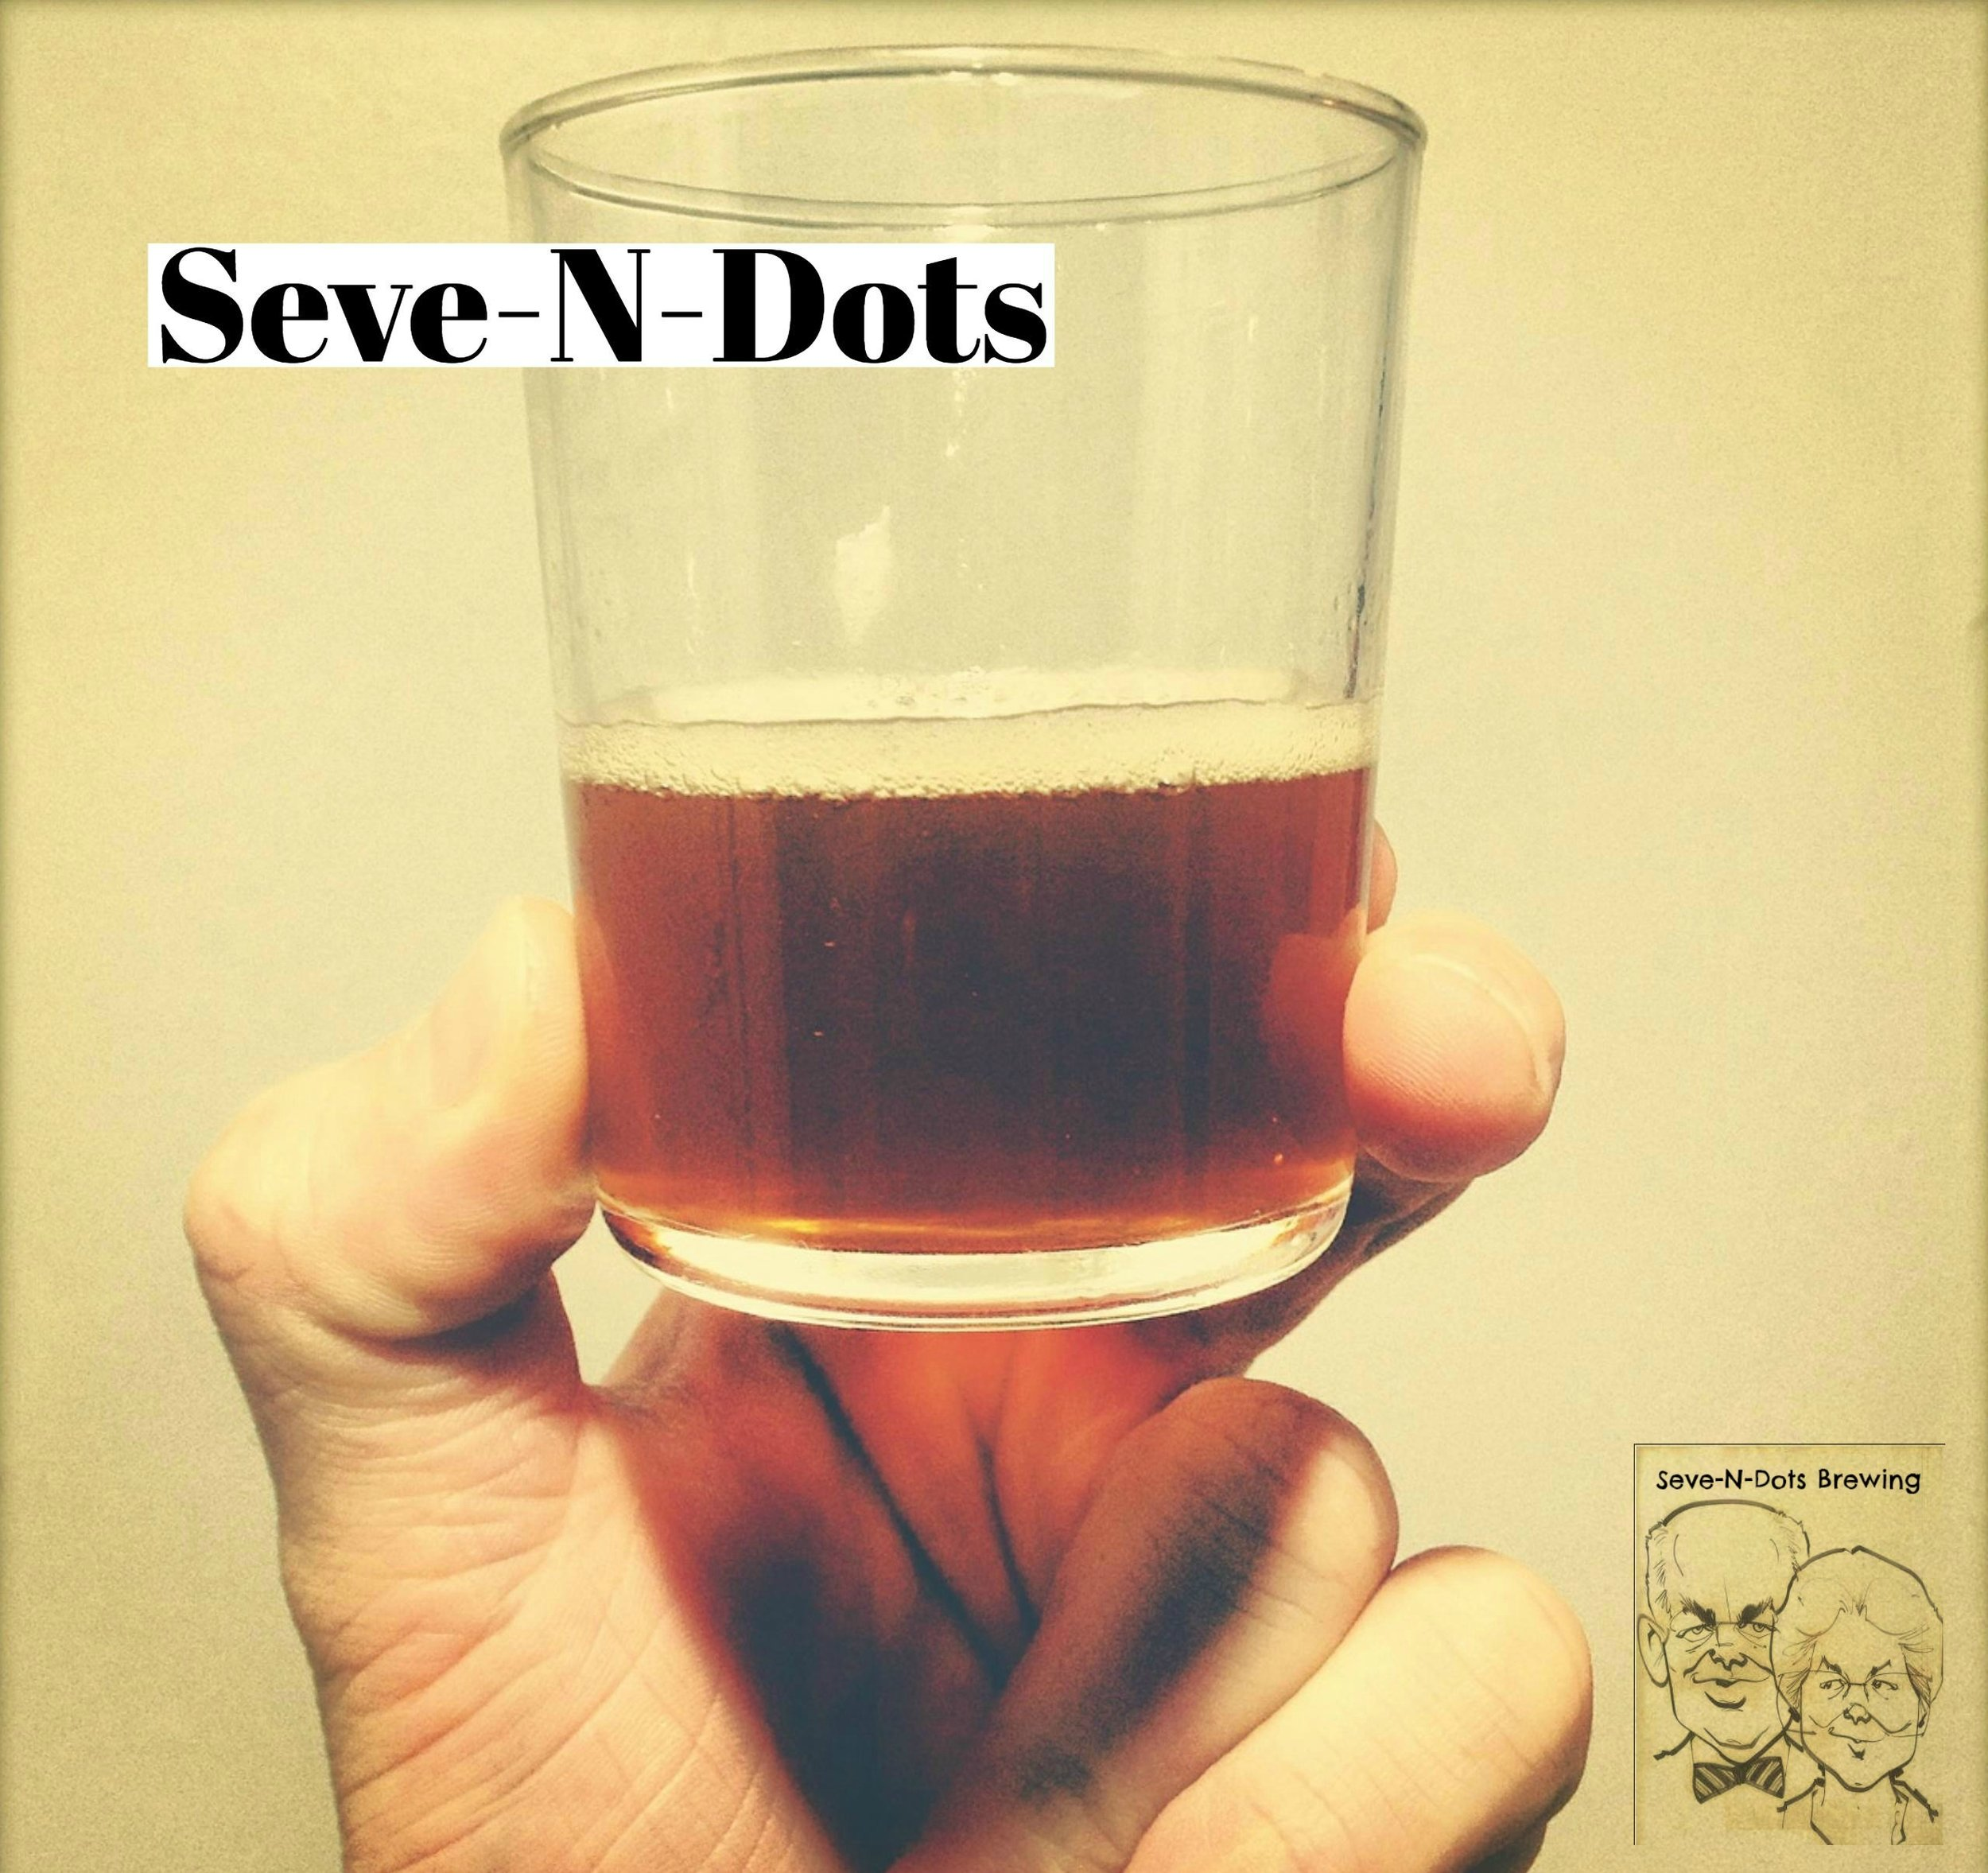 Sev-N-Dots